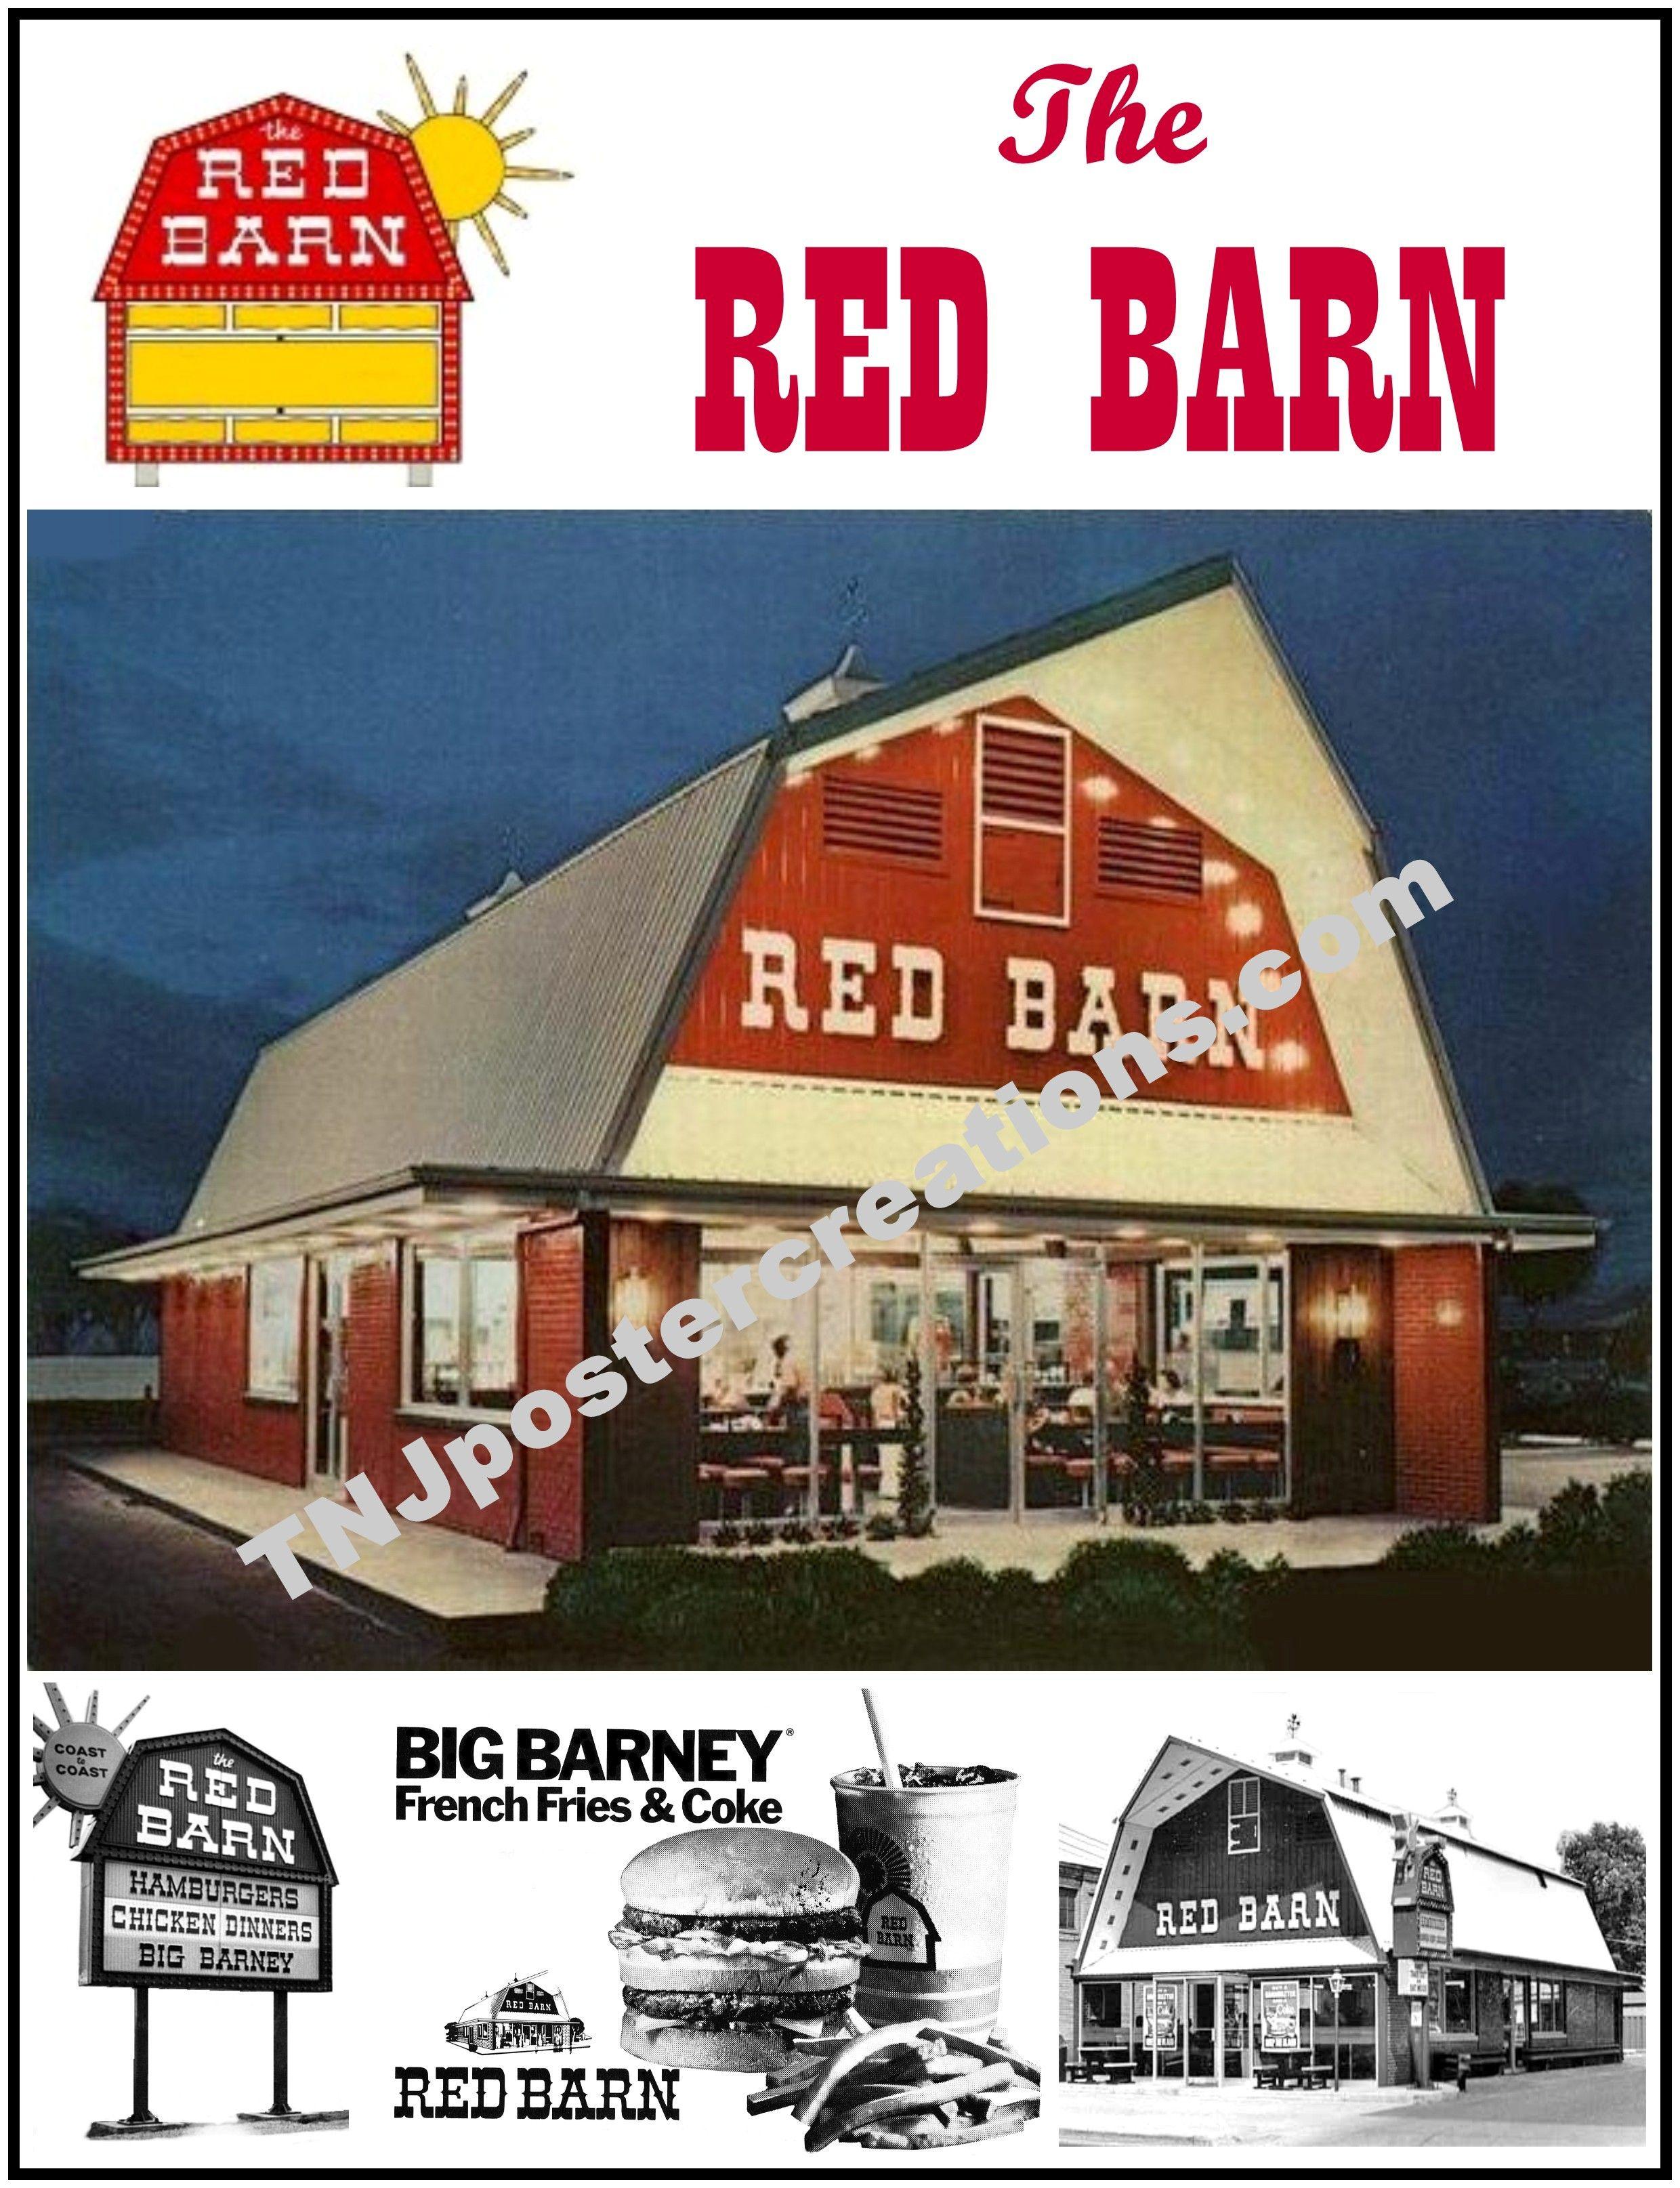 Red Barn Fast Food Restaurant